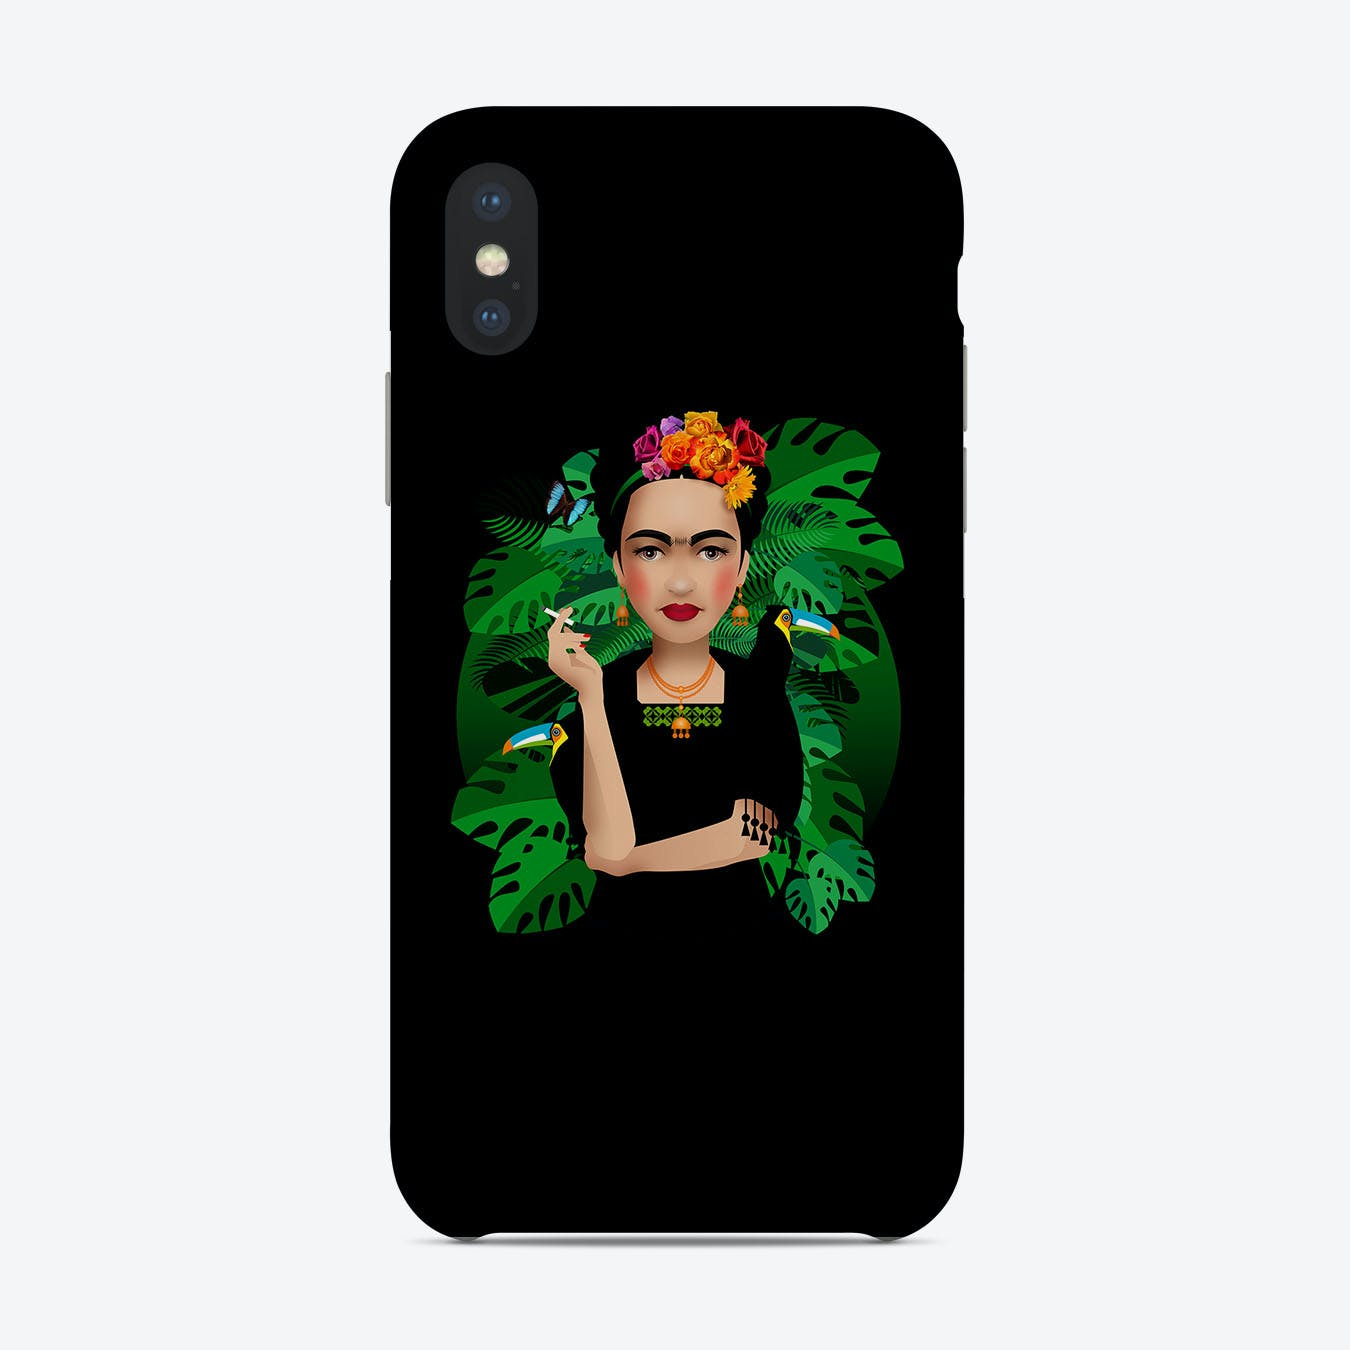 cover iphone frida kahlo